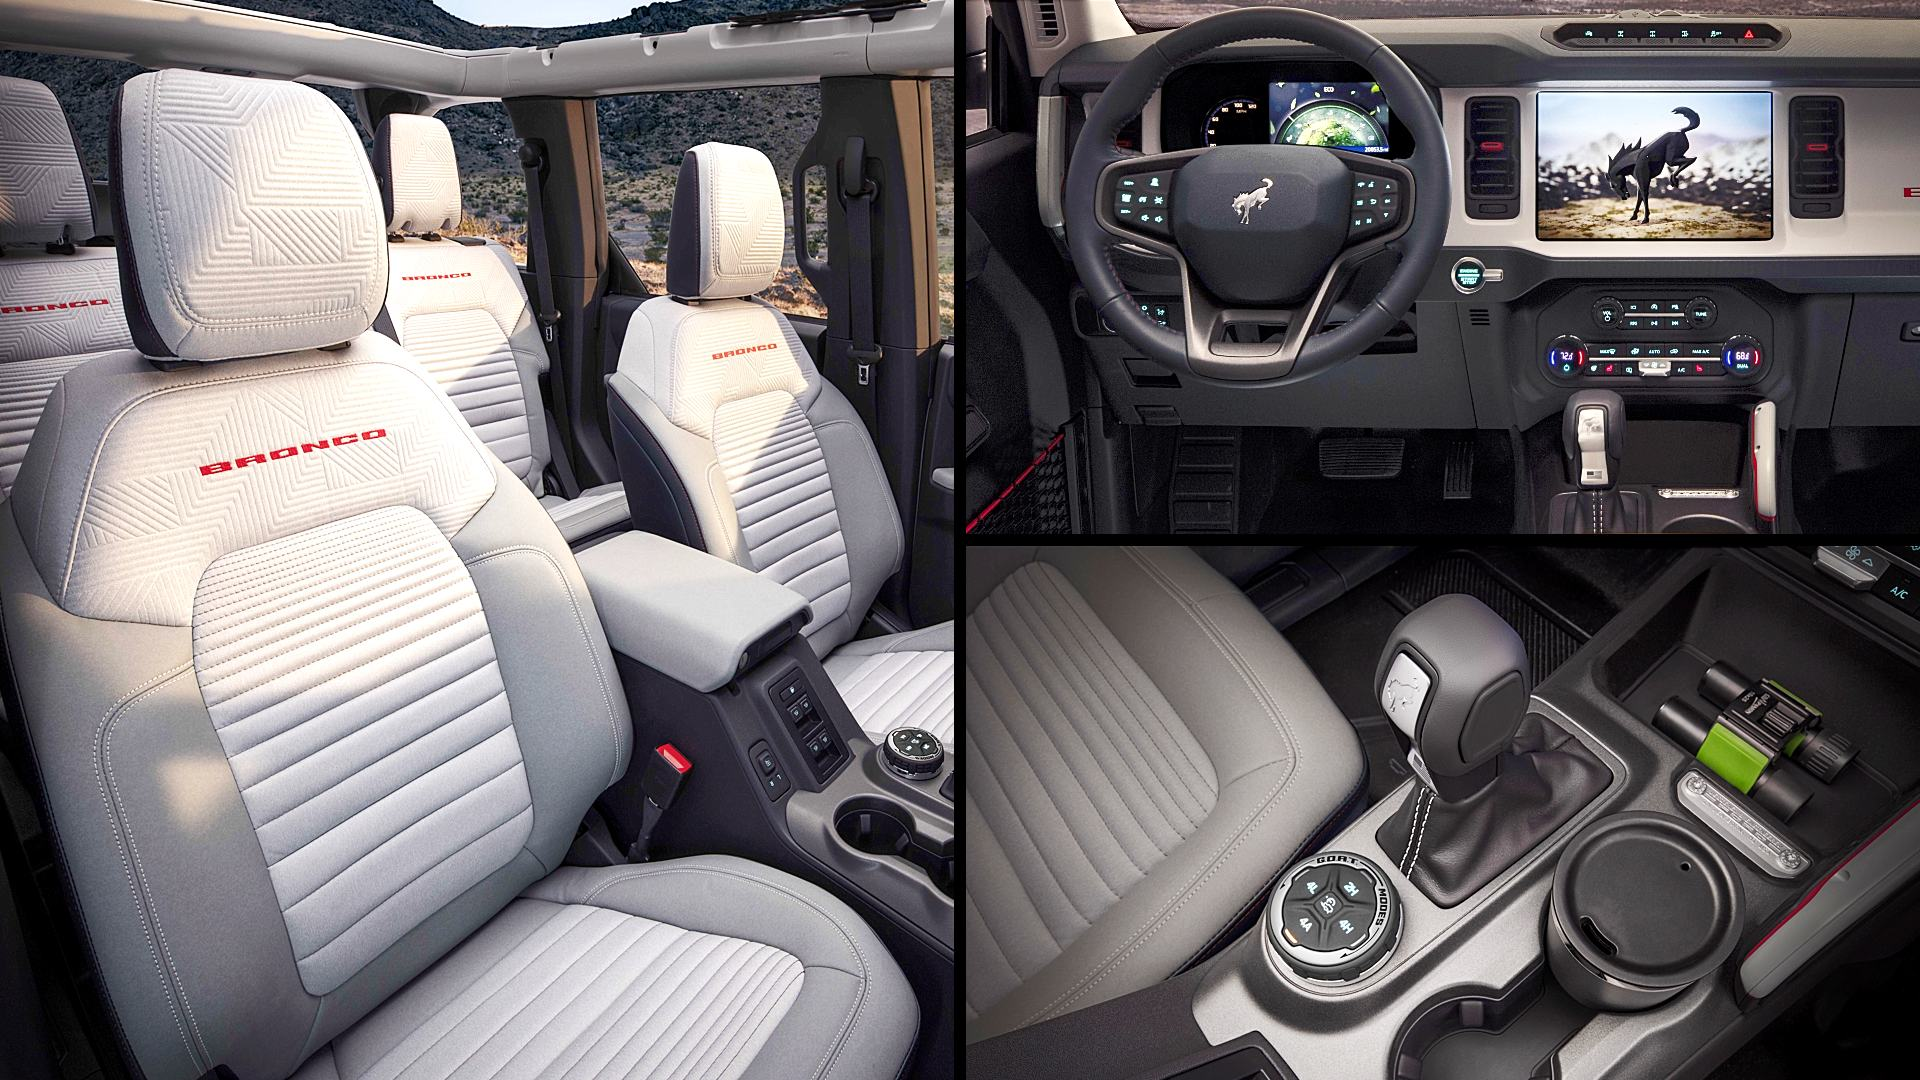 2021 Ford Bronco 4 Door Interior Images